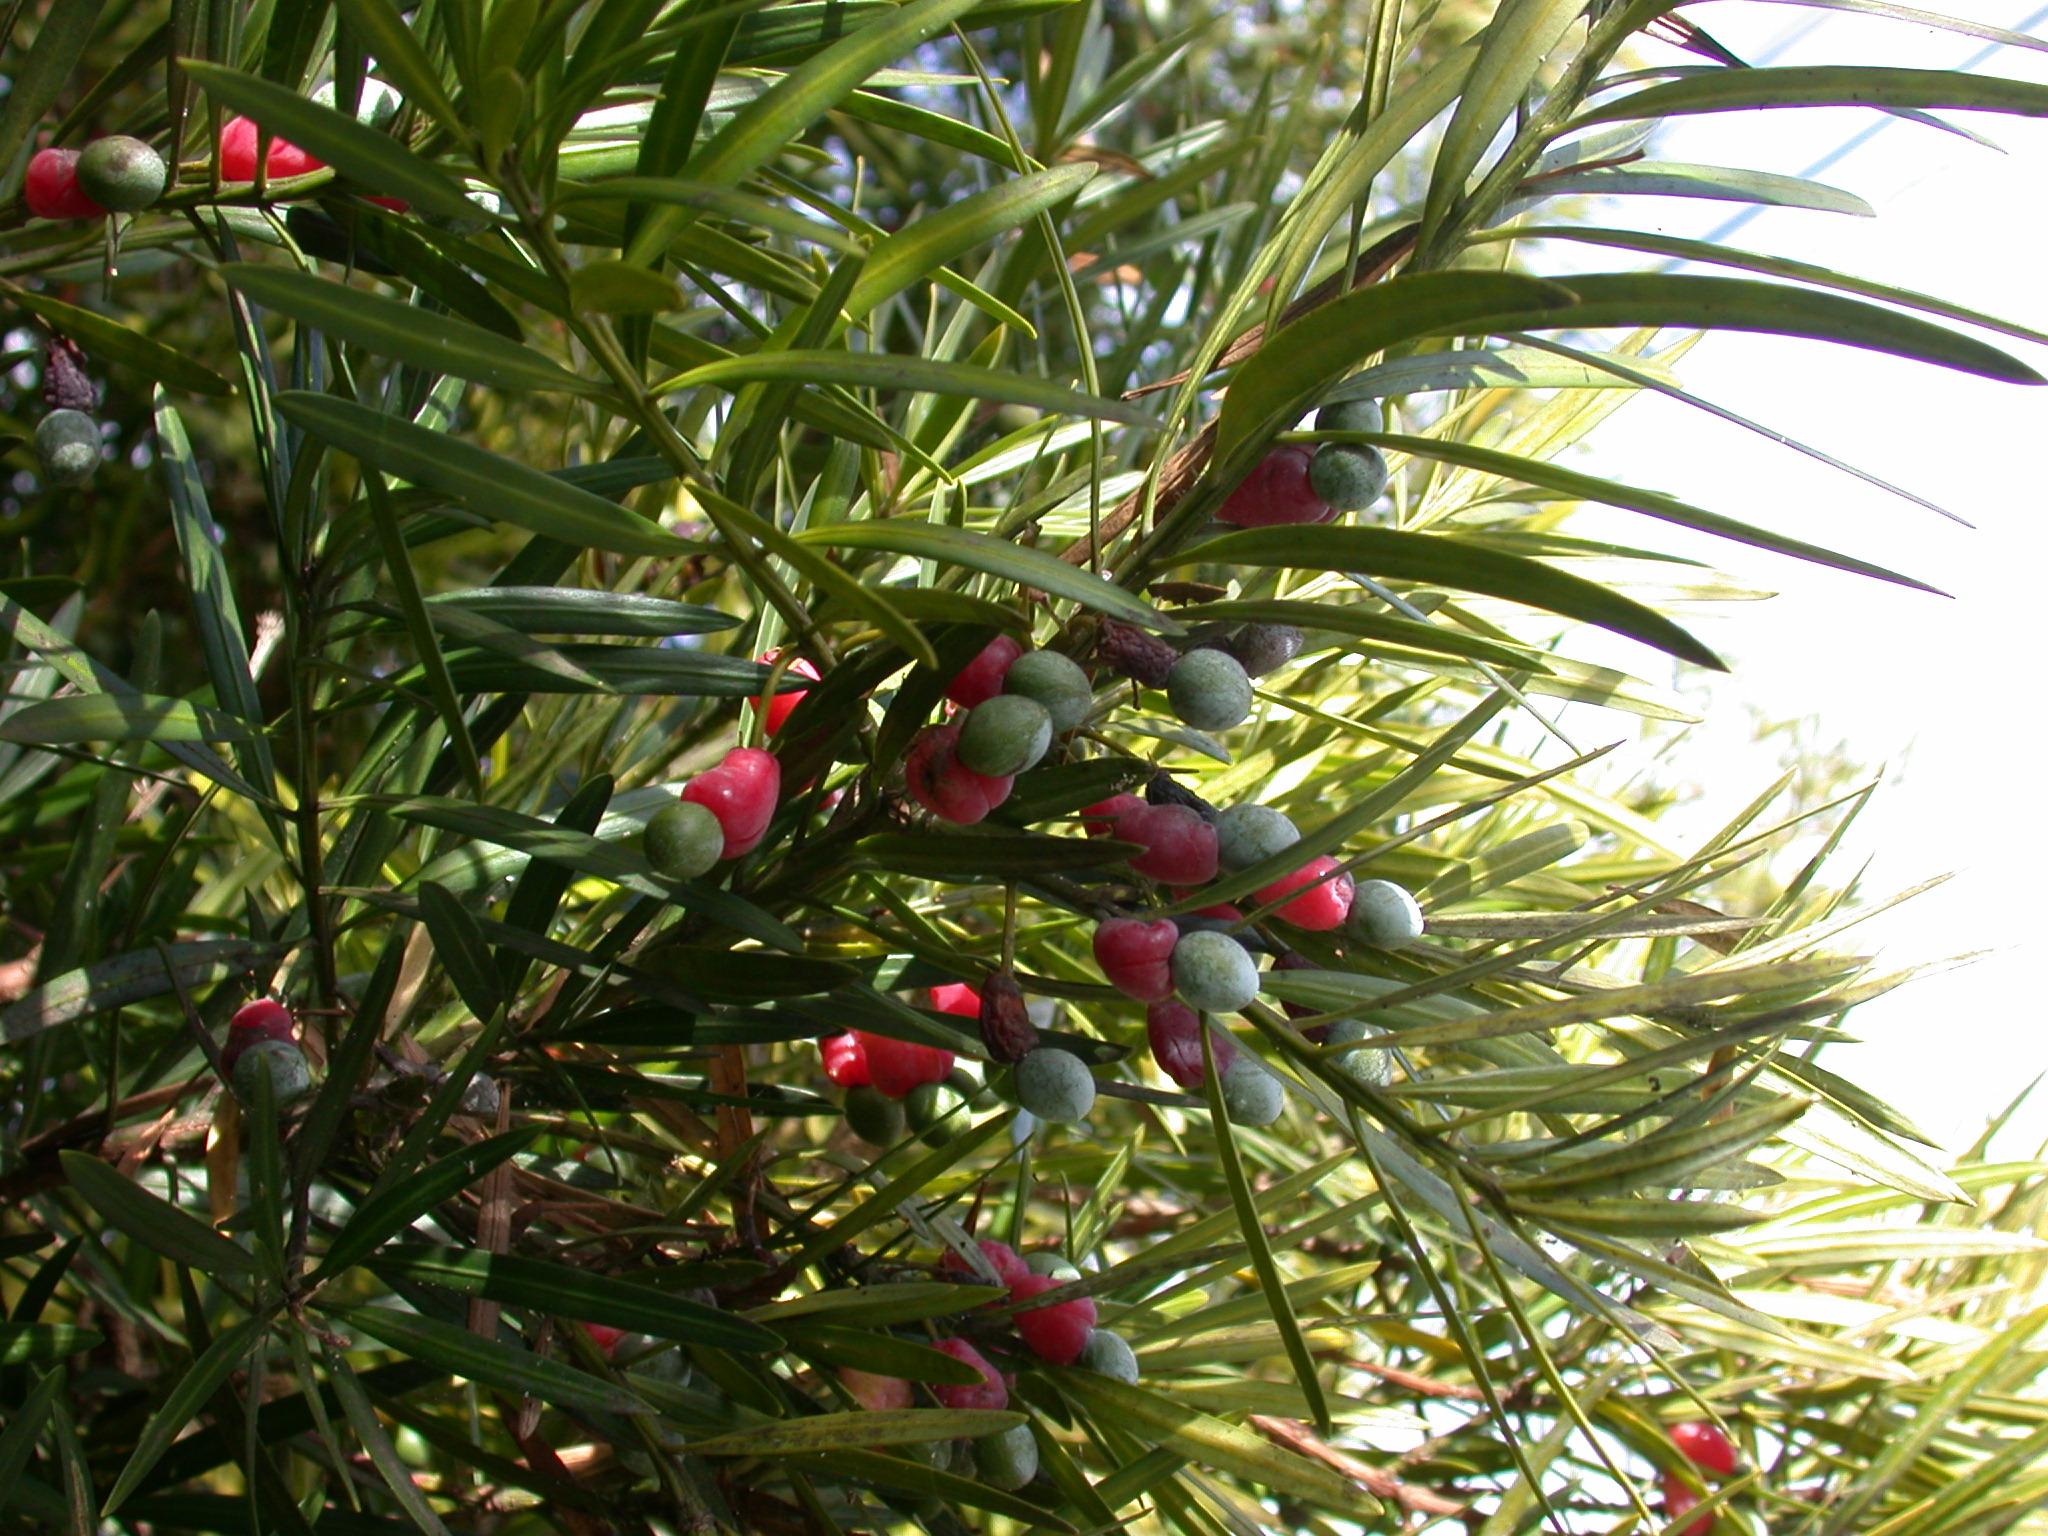 File:Podocarpus macrophyllus inumaki.JPG - Wikipedia